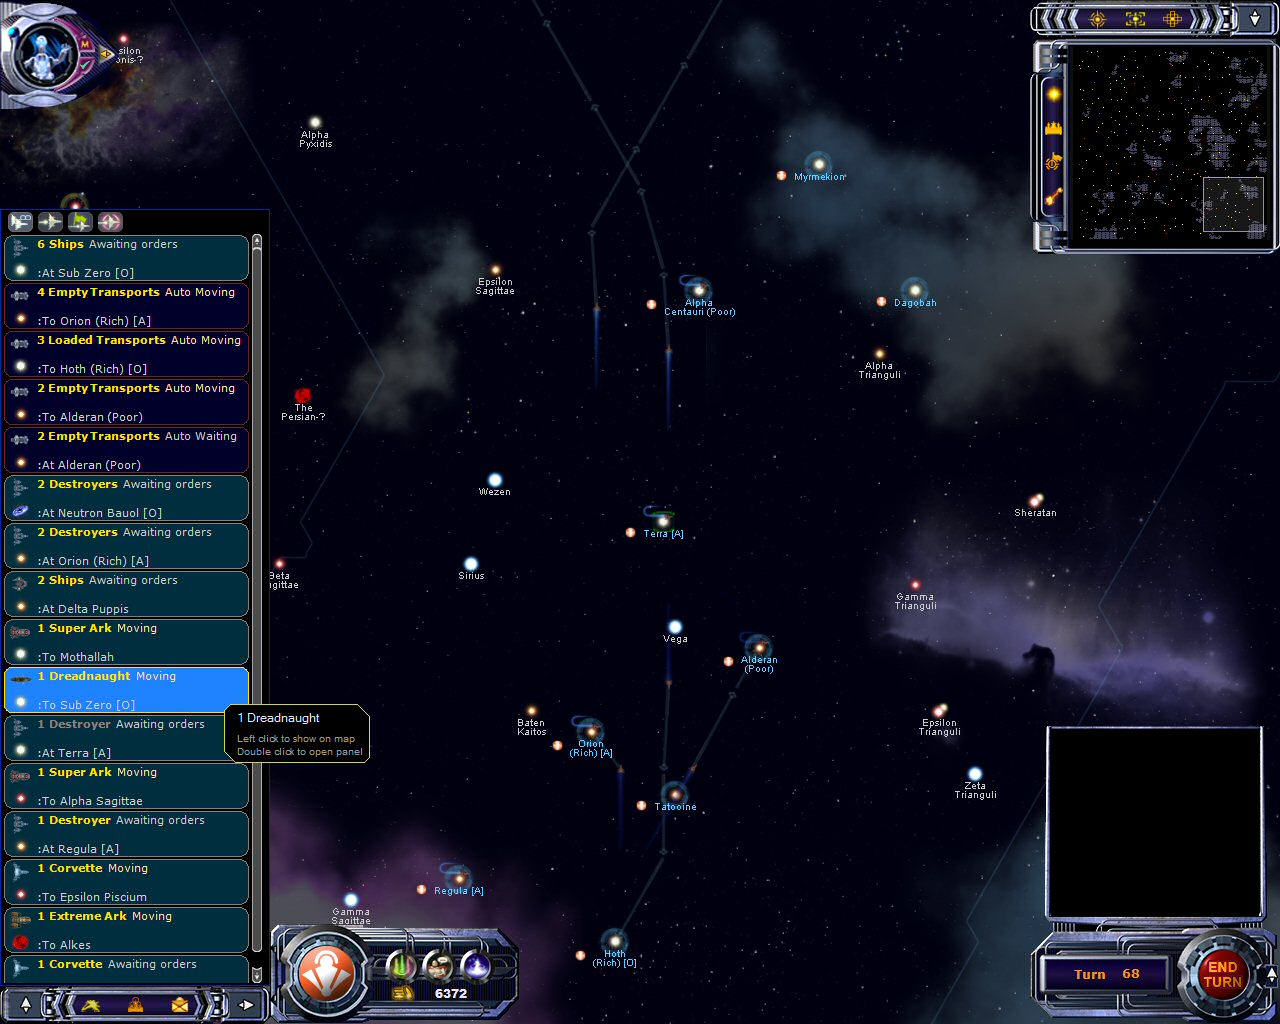 Armada 2526: User Interface - Fleets Management